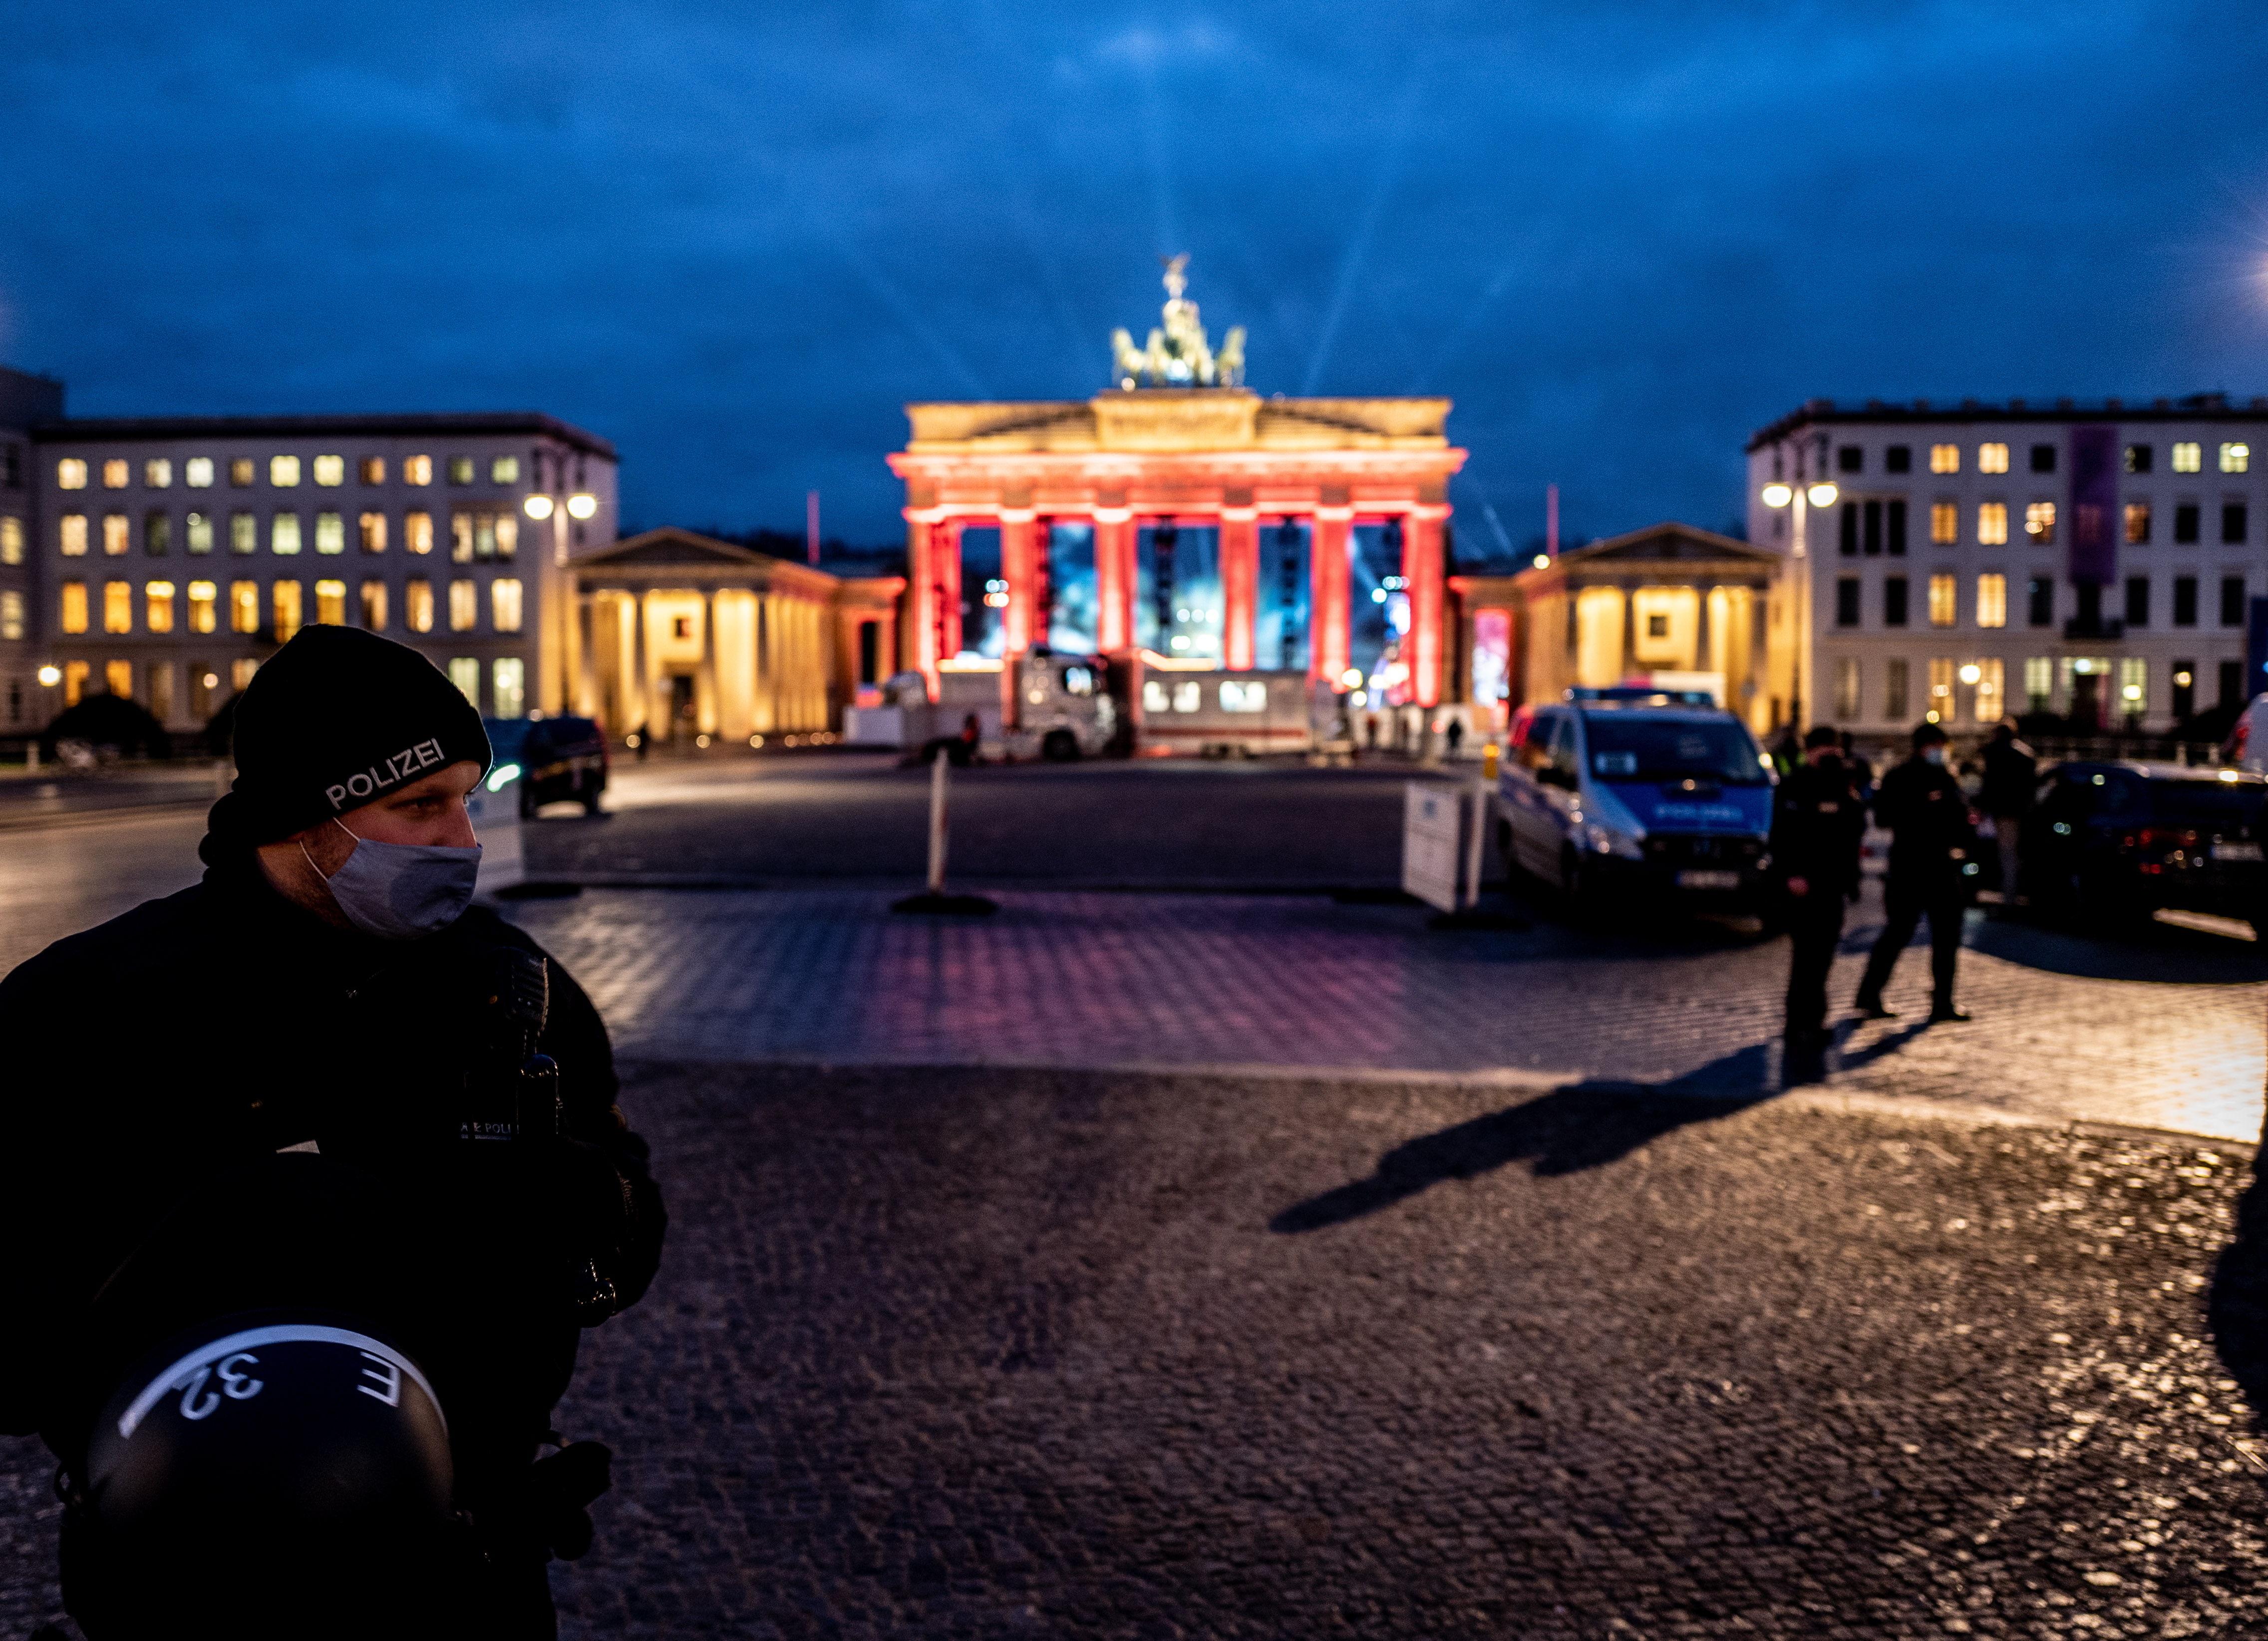 Medidas se seguridad para Nochevieja en Berlín.